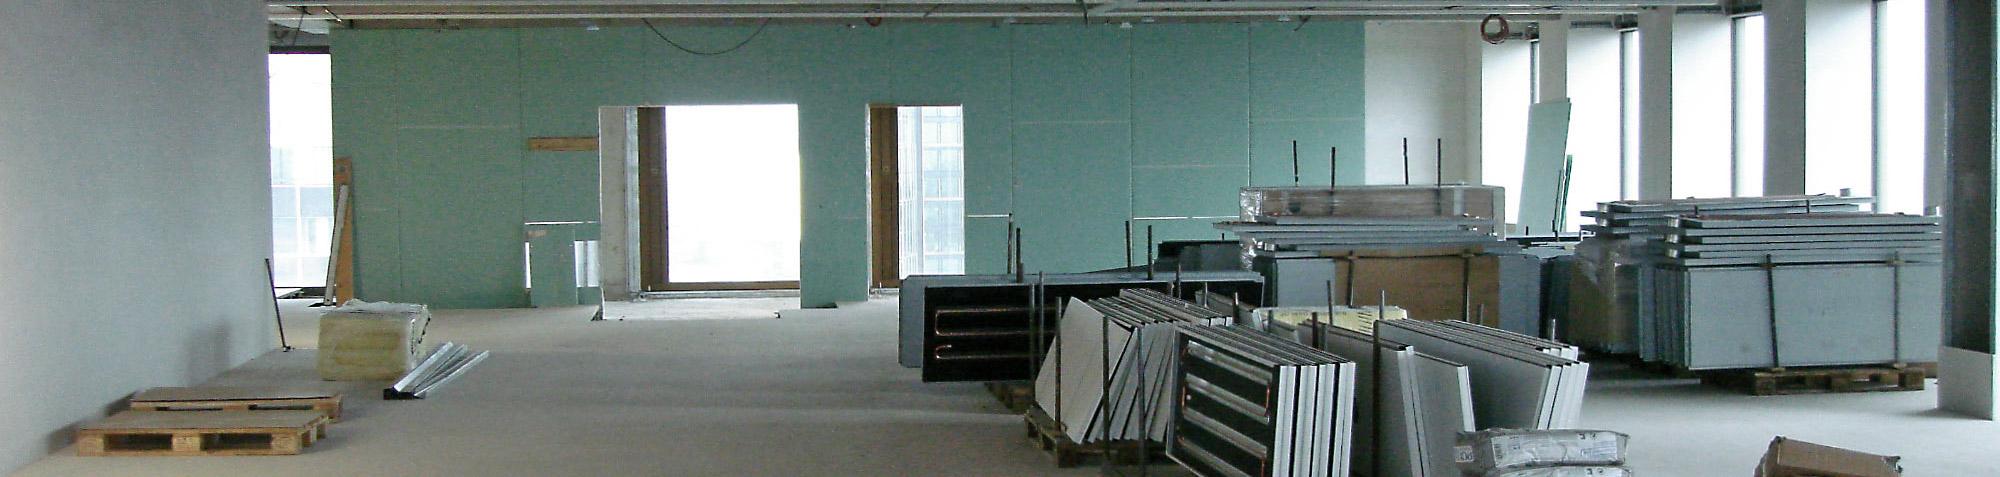 BGF - Bruttogrundfläche Definition - Bruttogeschossflaeche Definition - Innenraum Baustelle - Hochhausbaustelle - Flächendefinition - Bruttogeschossfläche